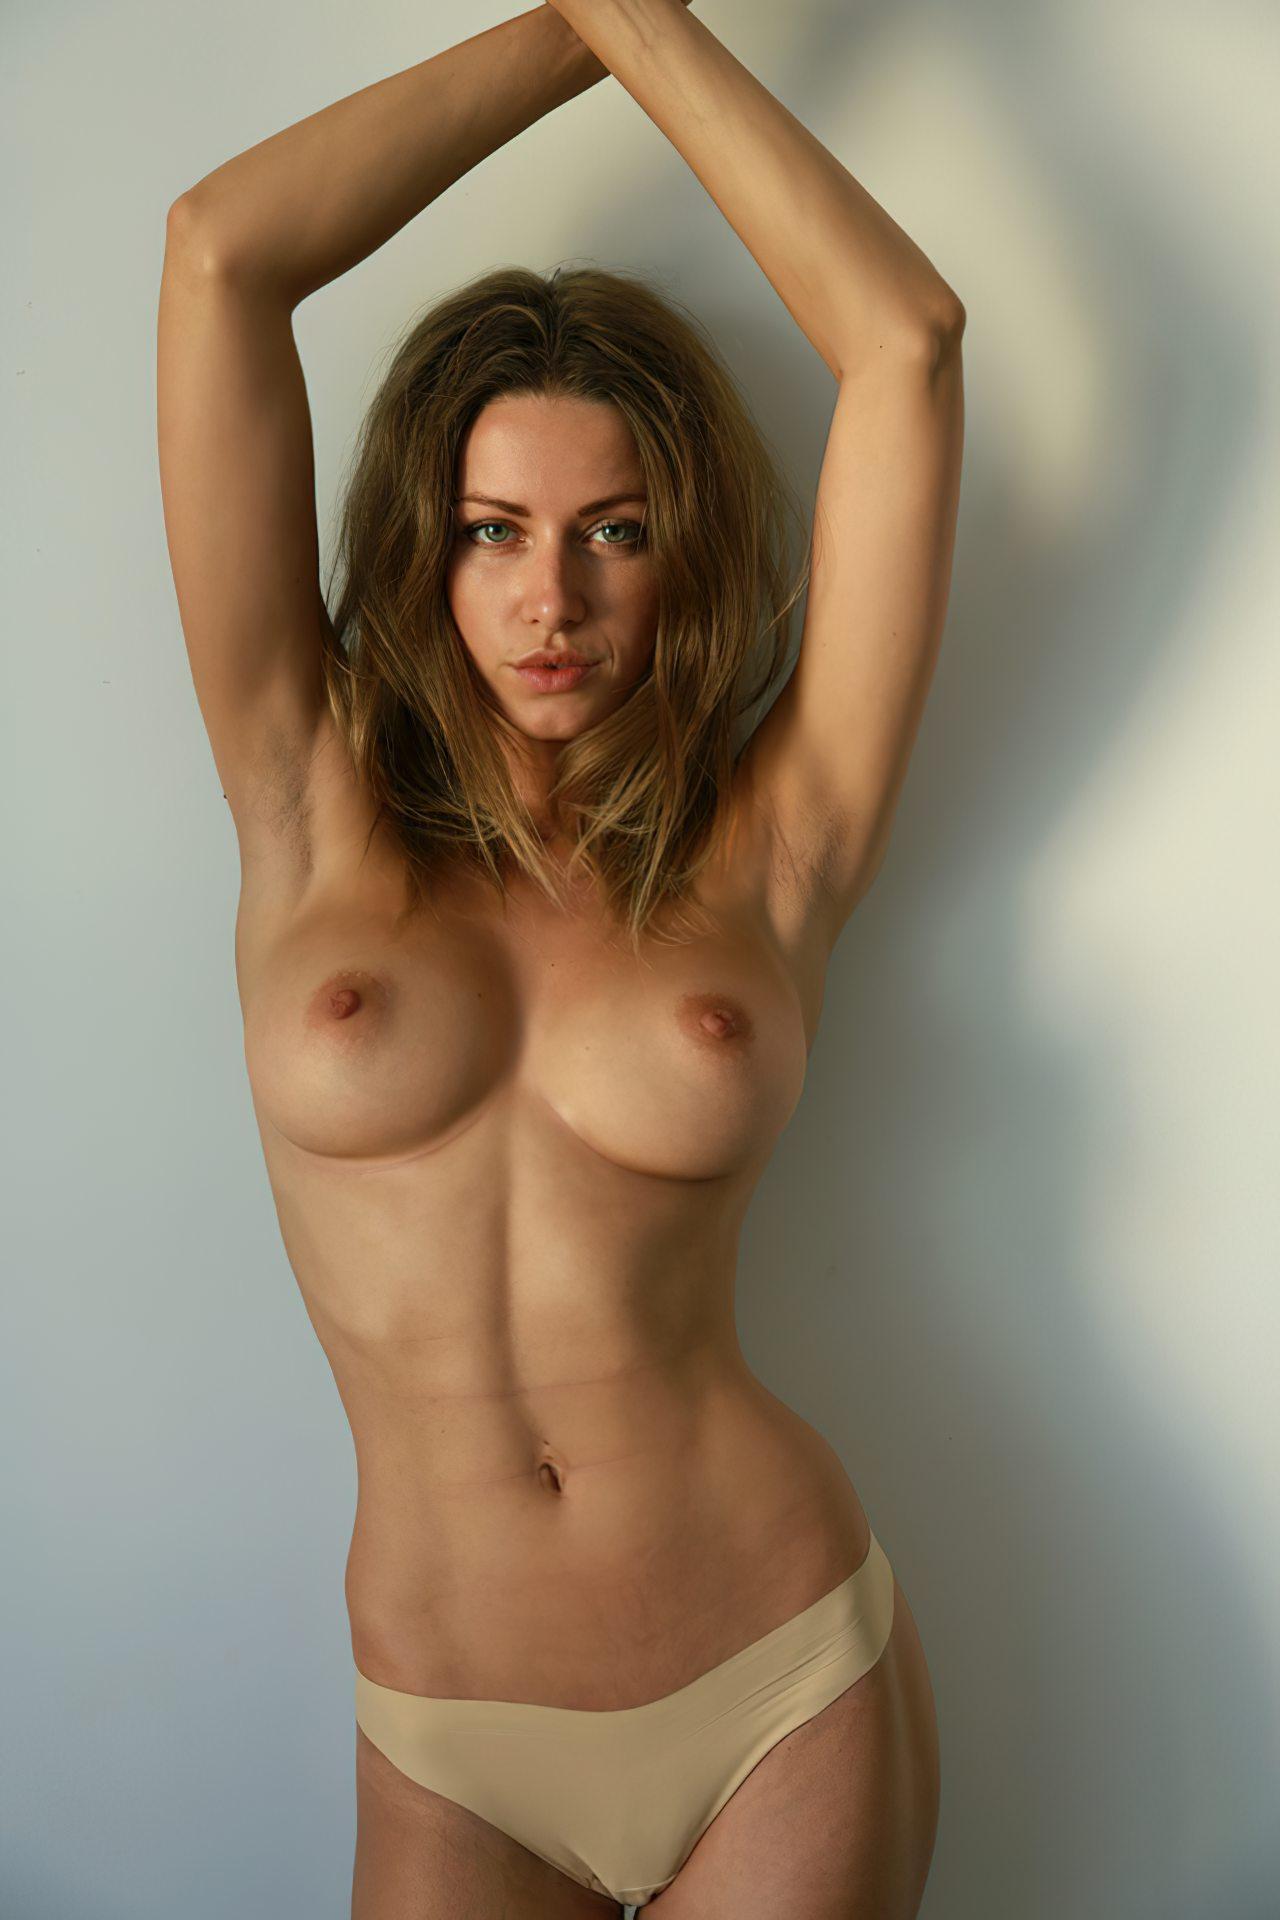 Mulheres Despidas Fotos (22)